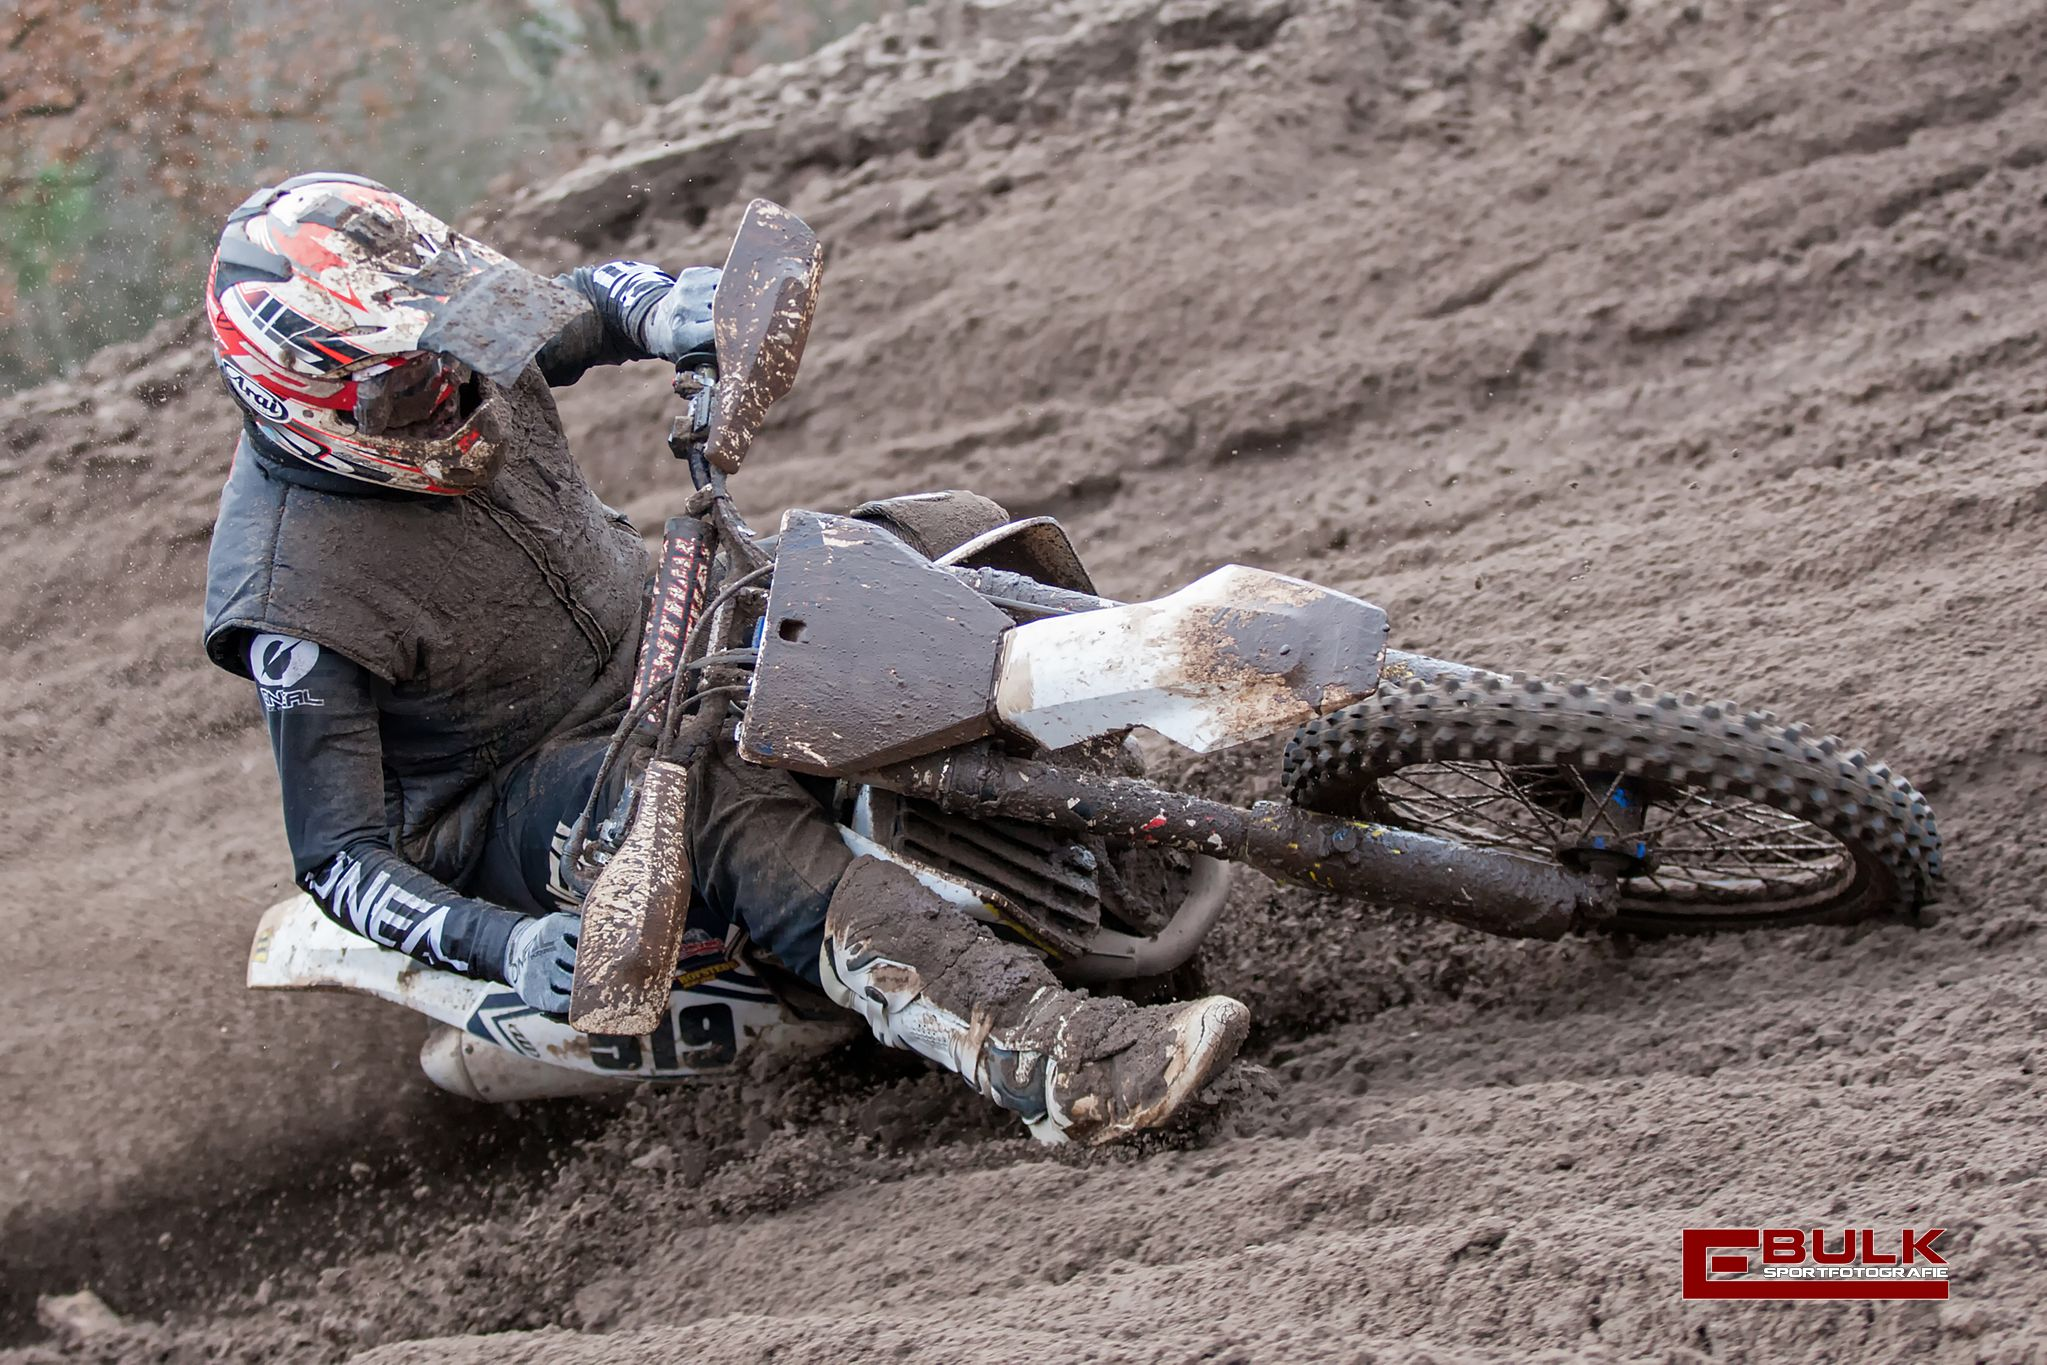 ebs_0847-ed_bulk_sportfotografie